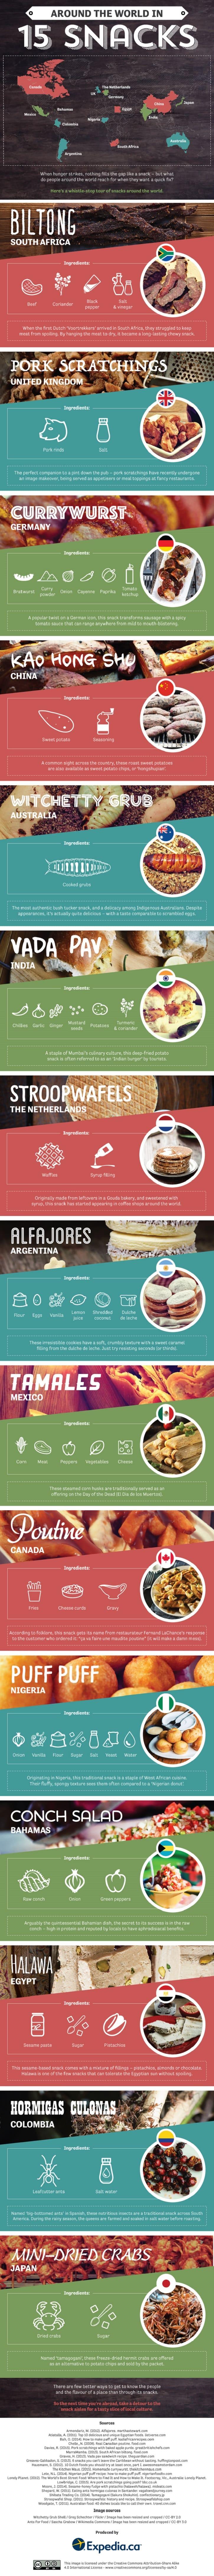 15-exotic-snacks